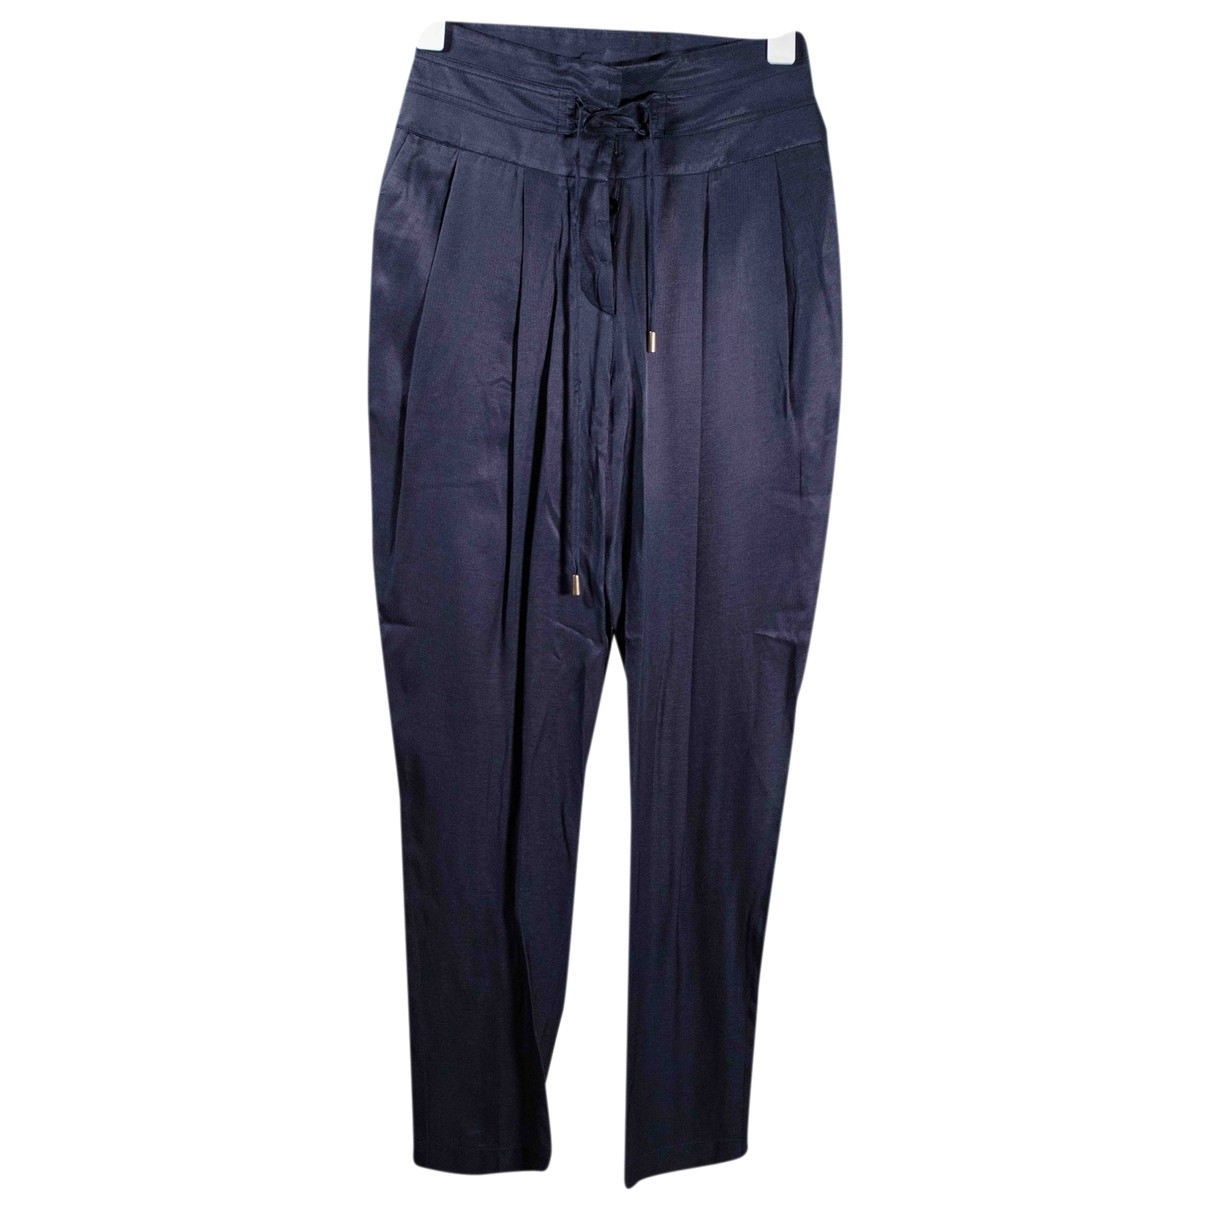 Patrizia Pepe \N Navy Trousers for Women 38 FR